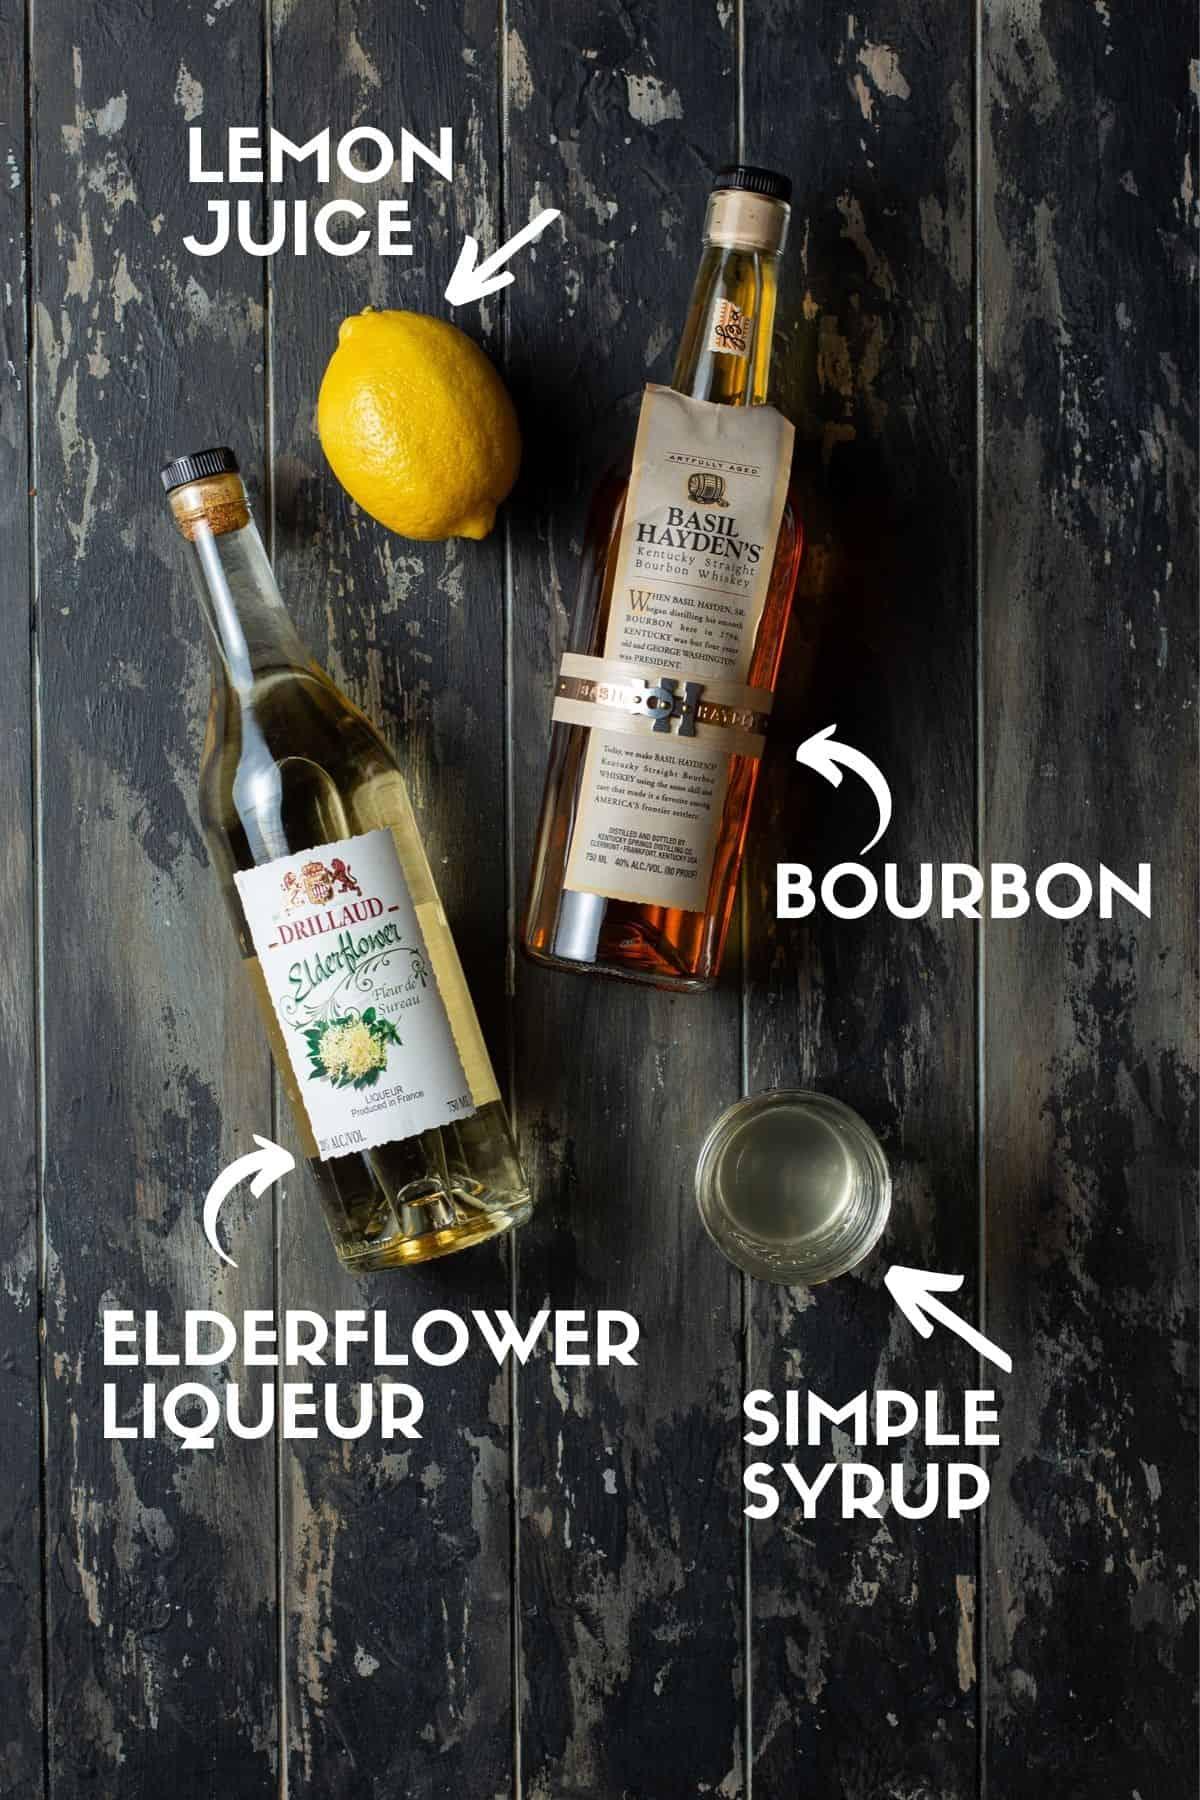 Cocktail ingredients including bourbon and elderflower liqueur.